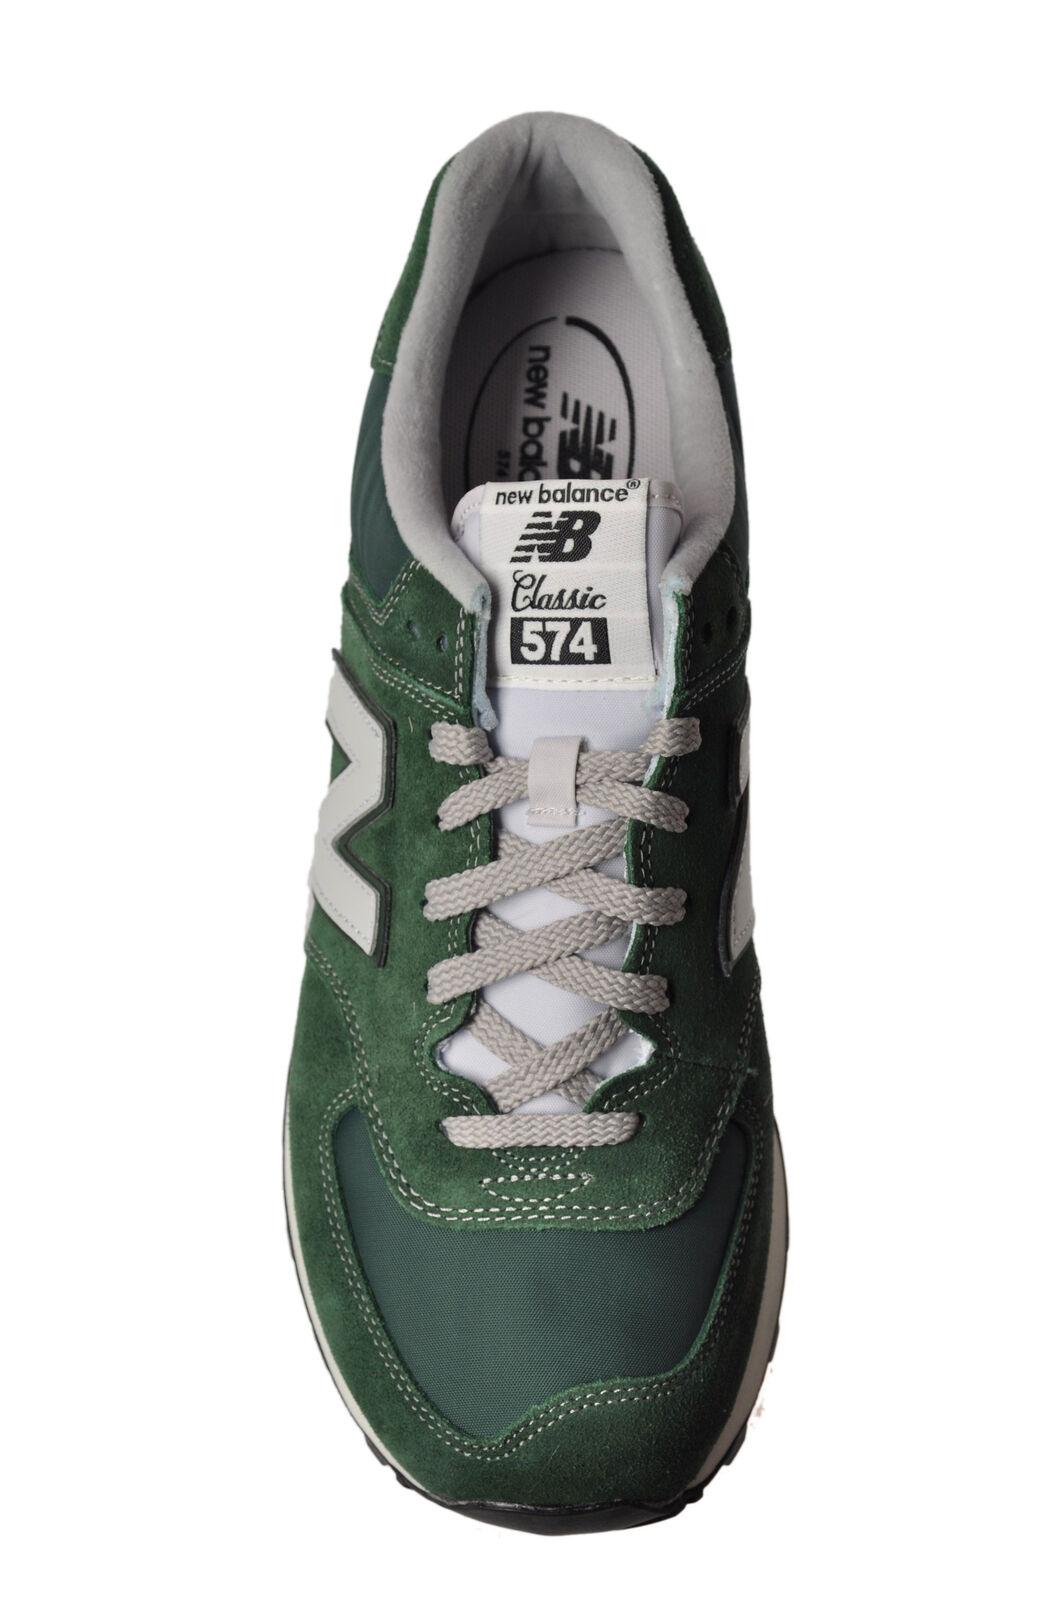 New Balance - - Zapatos-Sneakers low - Hombre - Verde - Balance 892413M184642 e2455d